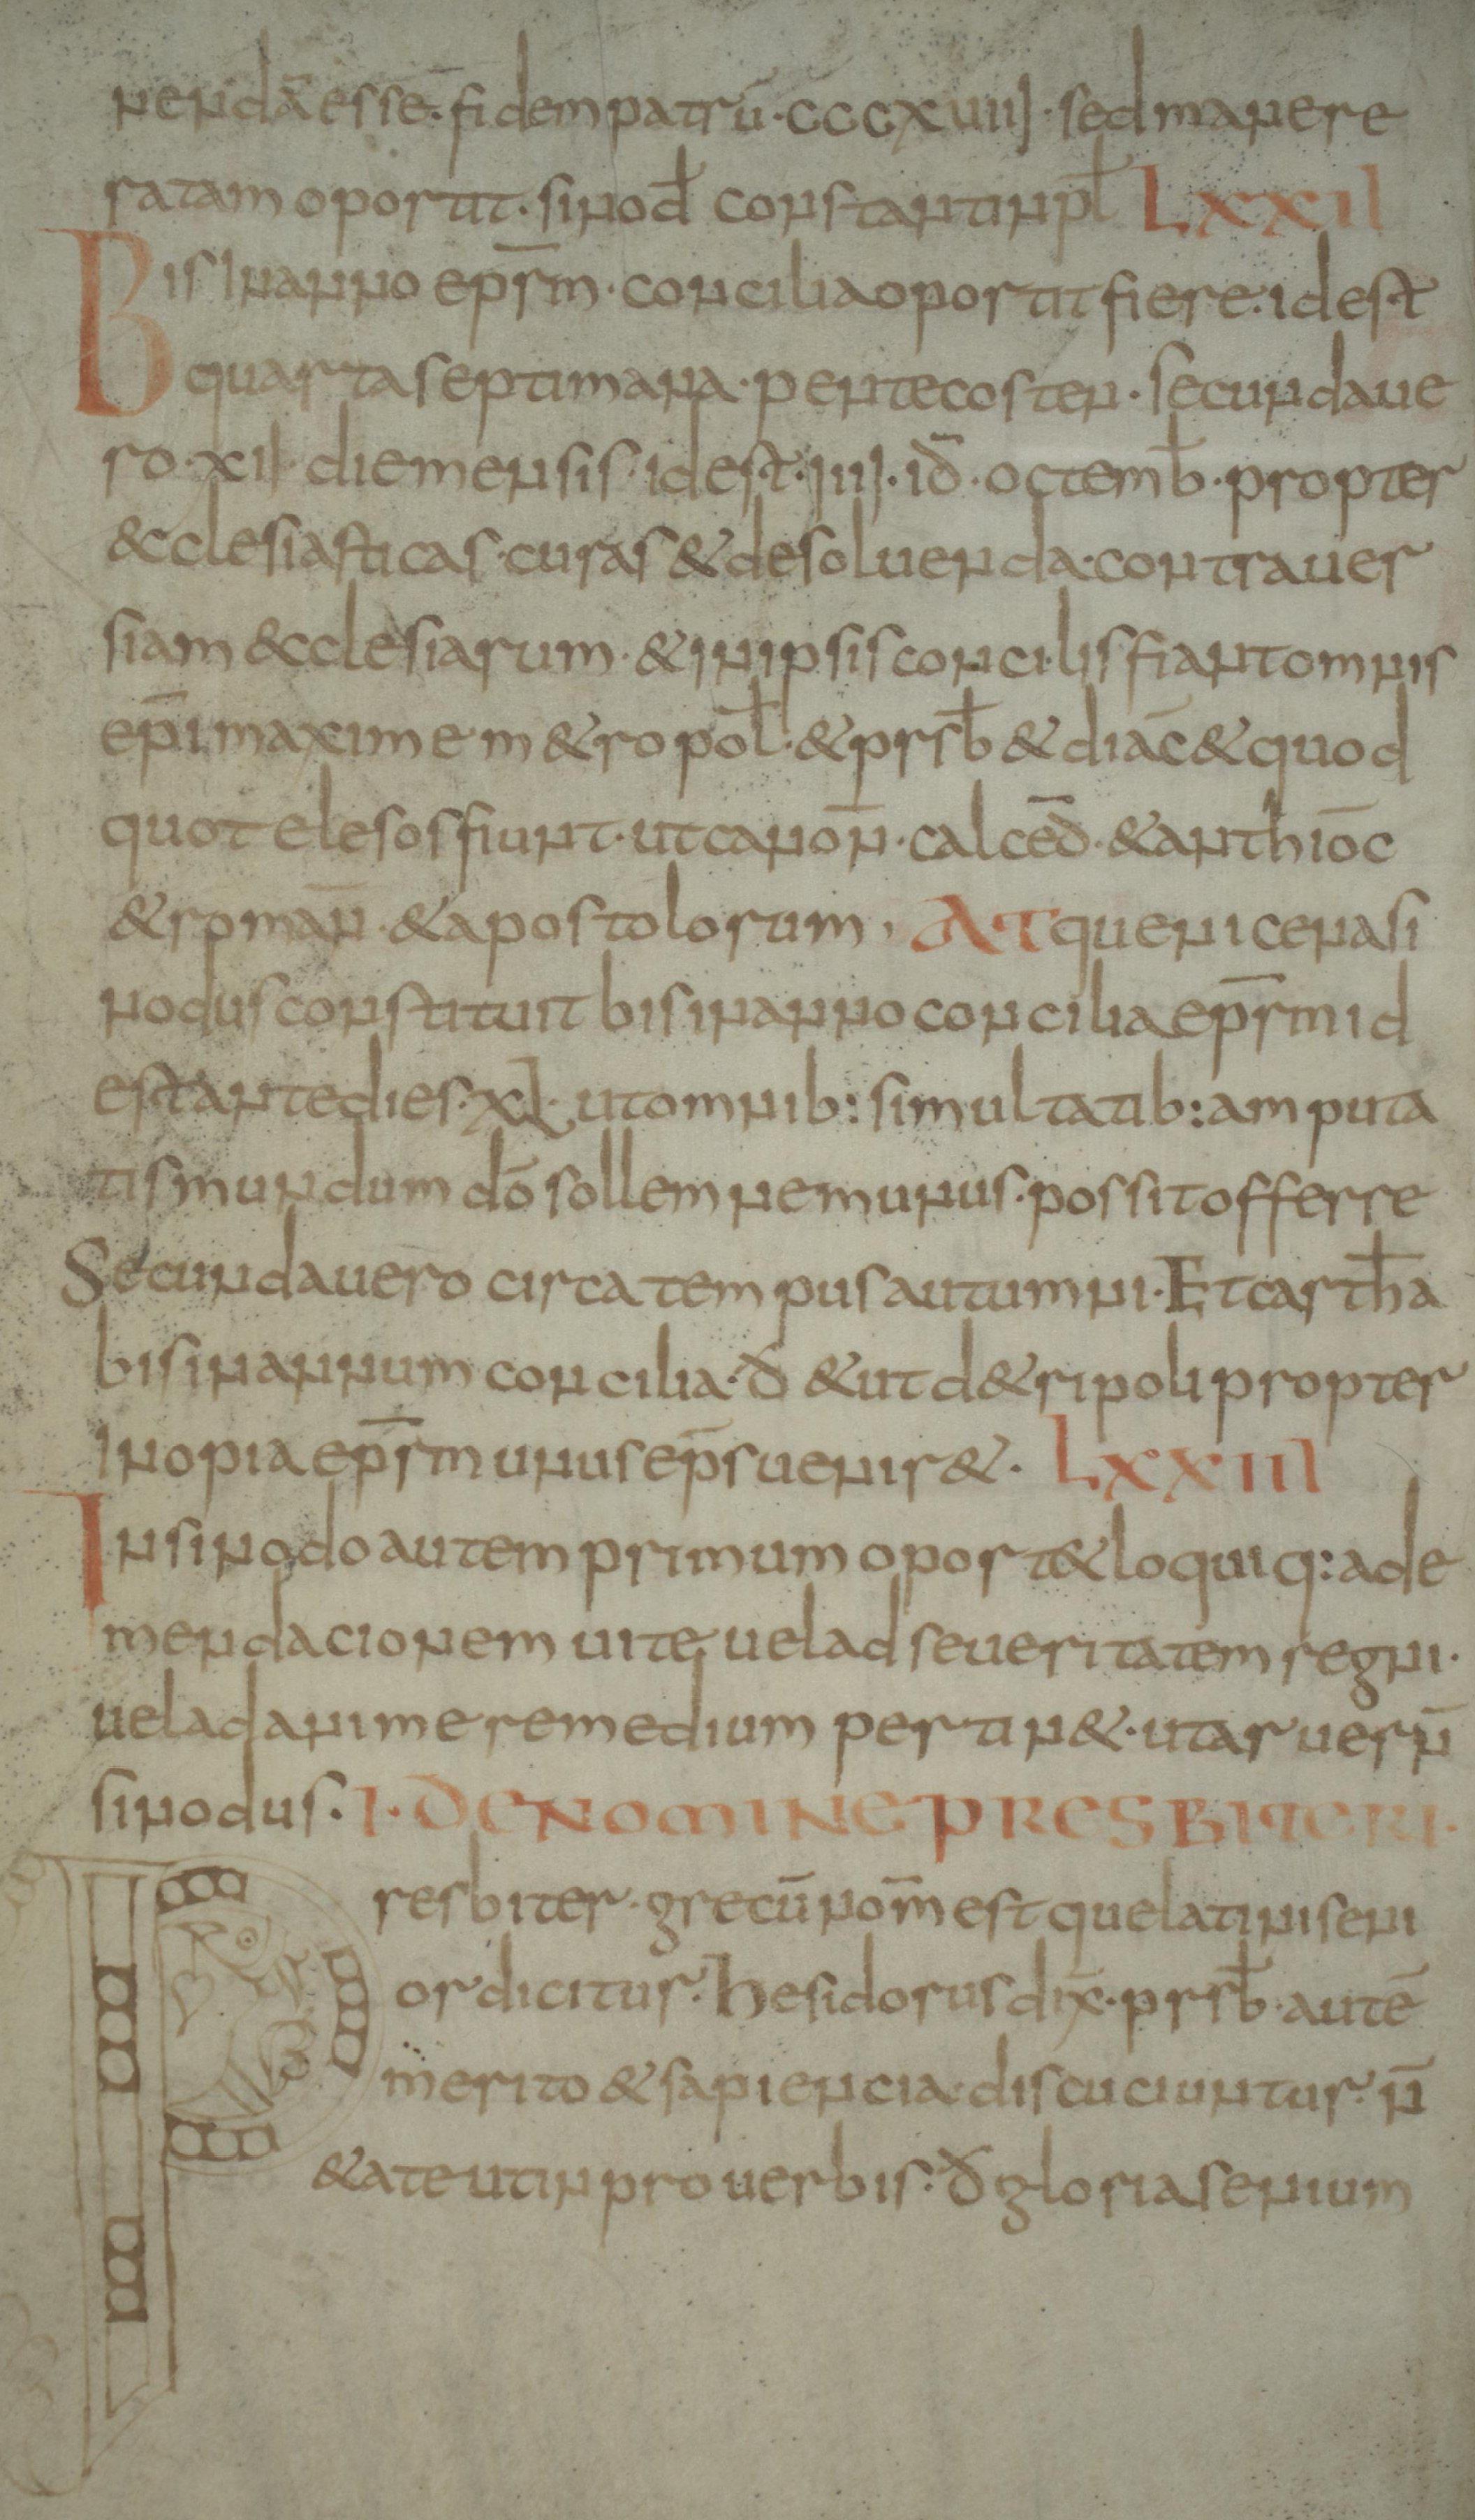 Collectio_Canonum_Hibernensis_Domkapitel_zu_Köln_Codex_210_15v